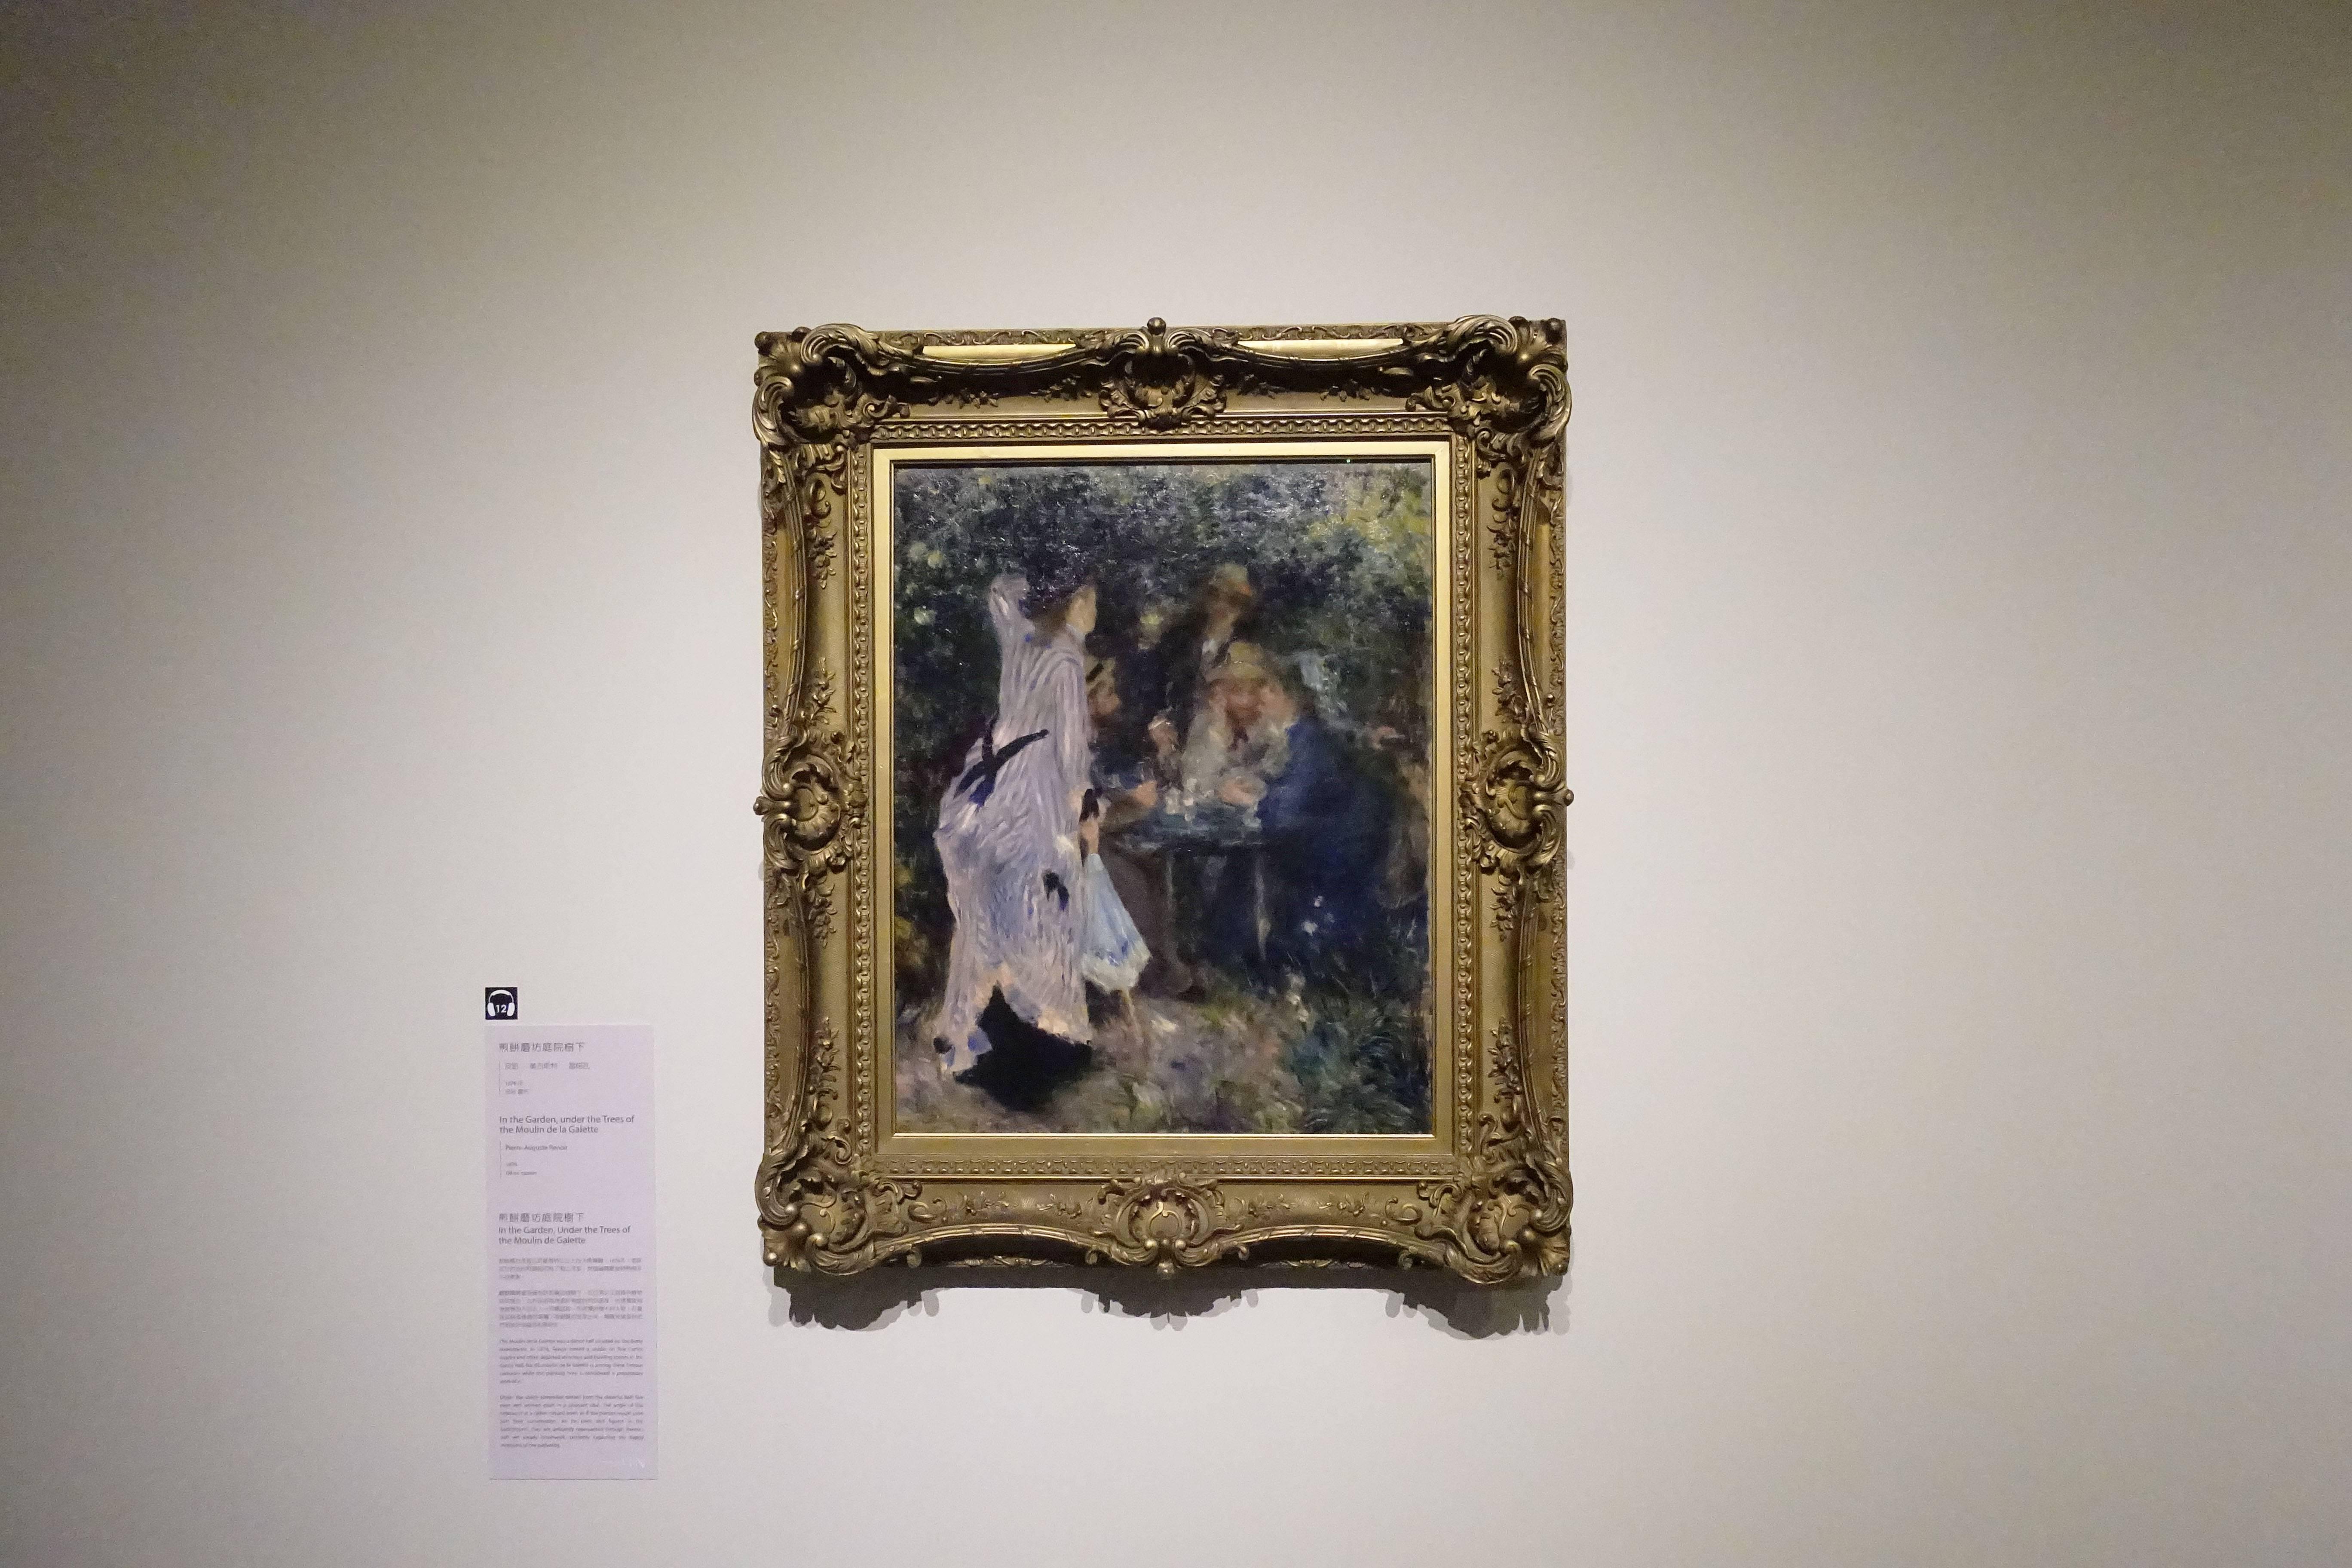 皮耶-奧古斯特.雷諾瓦 Pierre-Auguste Renoir ,《煎餅磨坊庭院樹下 In the Garden, under the Trees of the Moulin de la Galette》,油彩、畫布 Oil on canvas,1876。